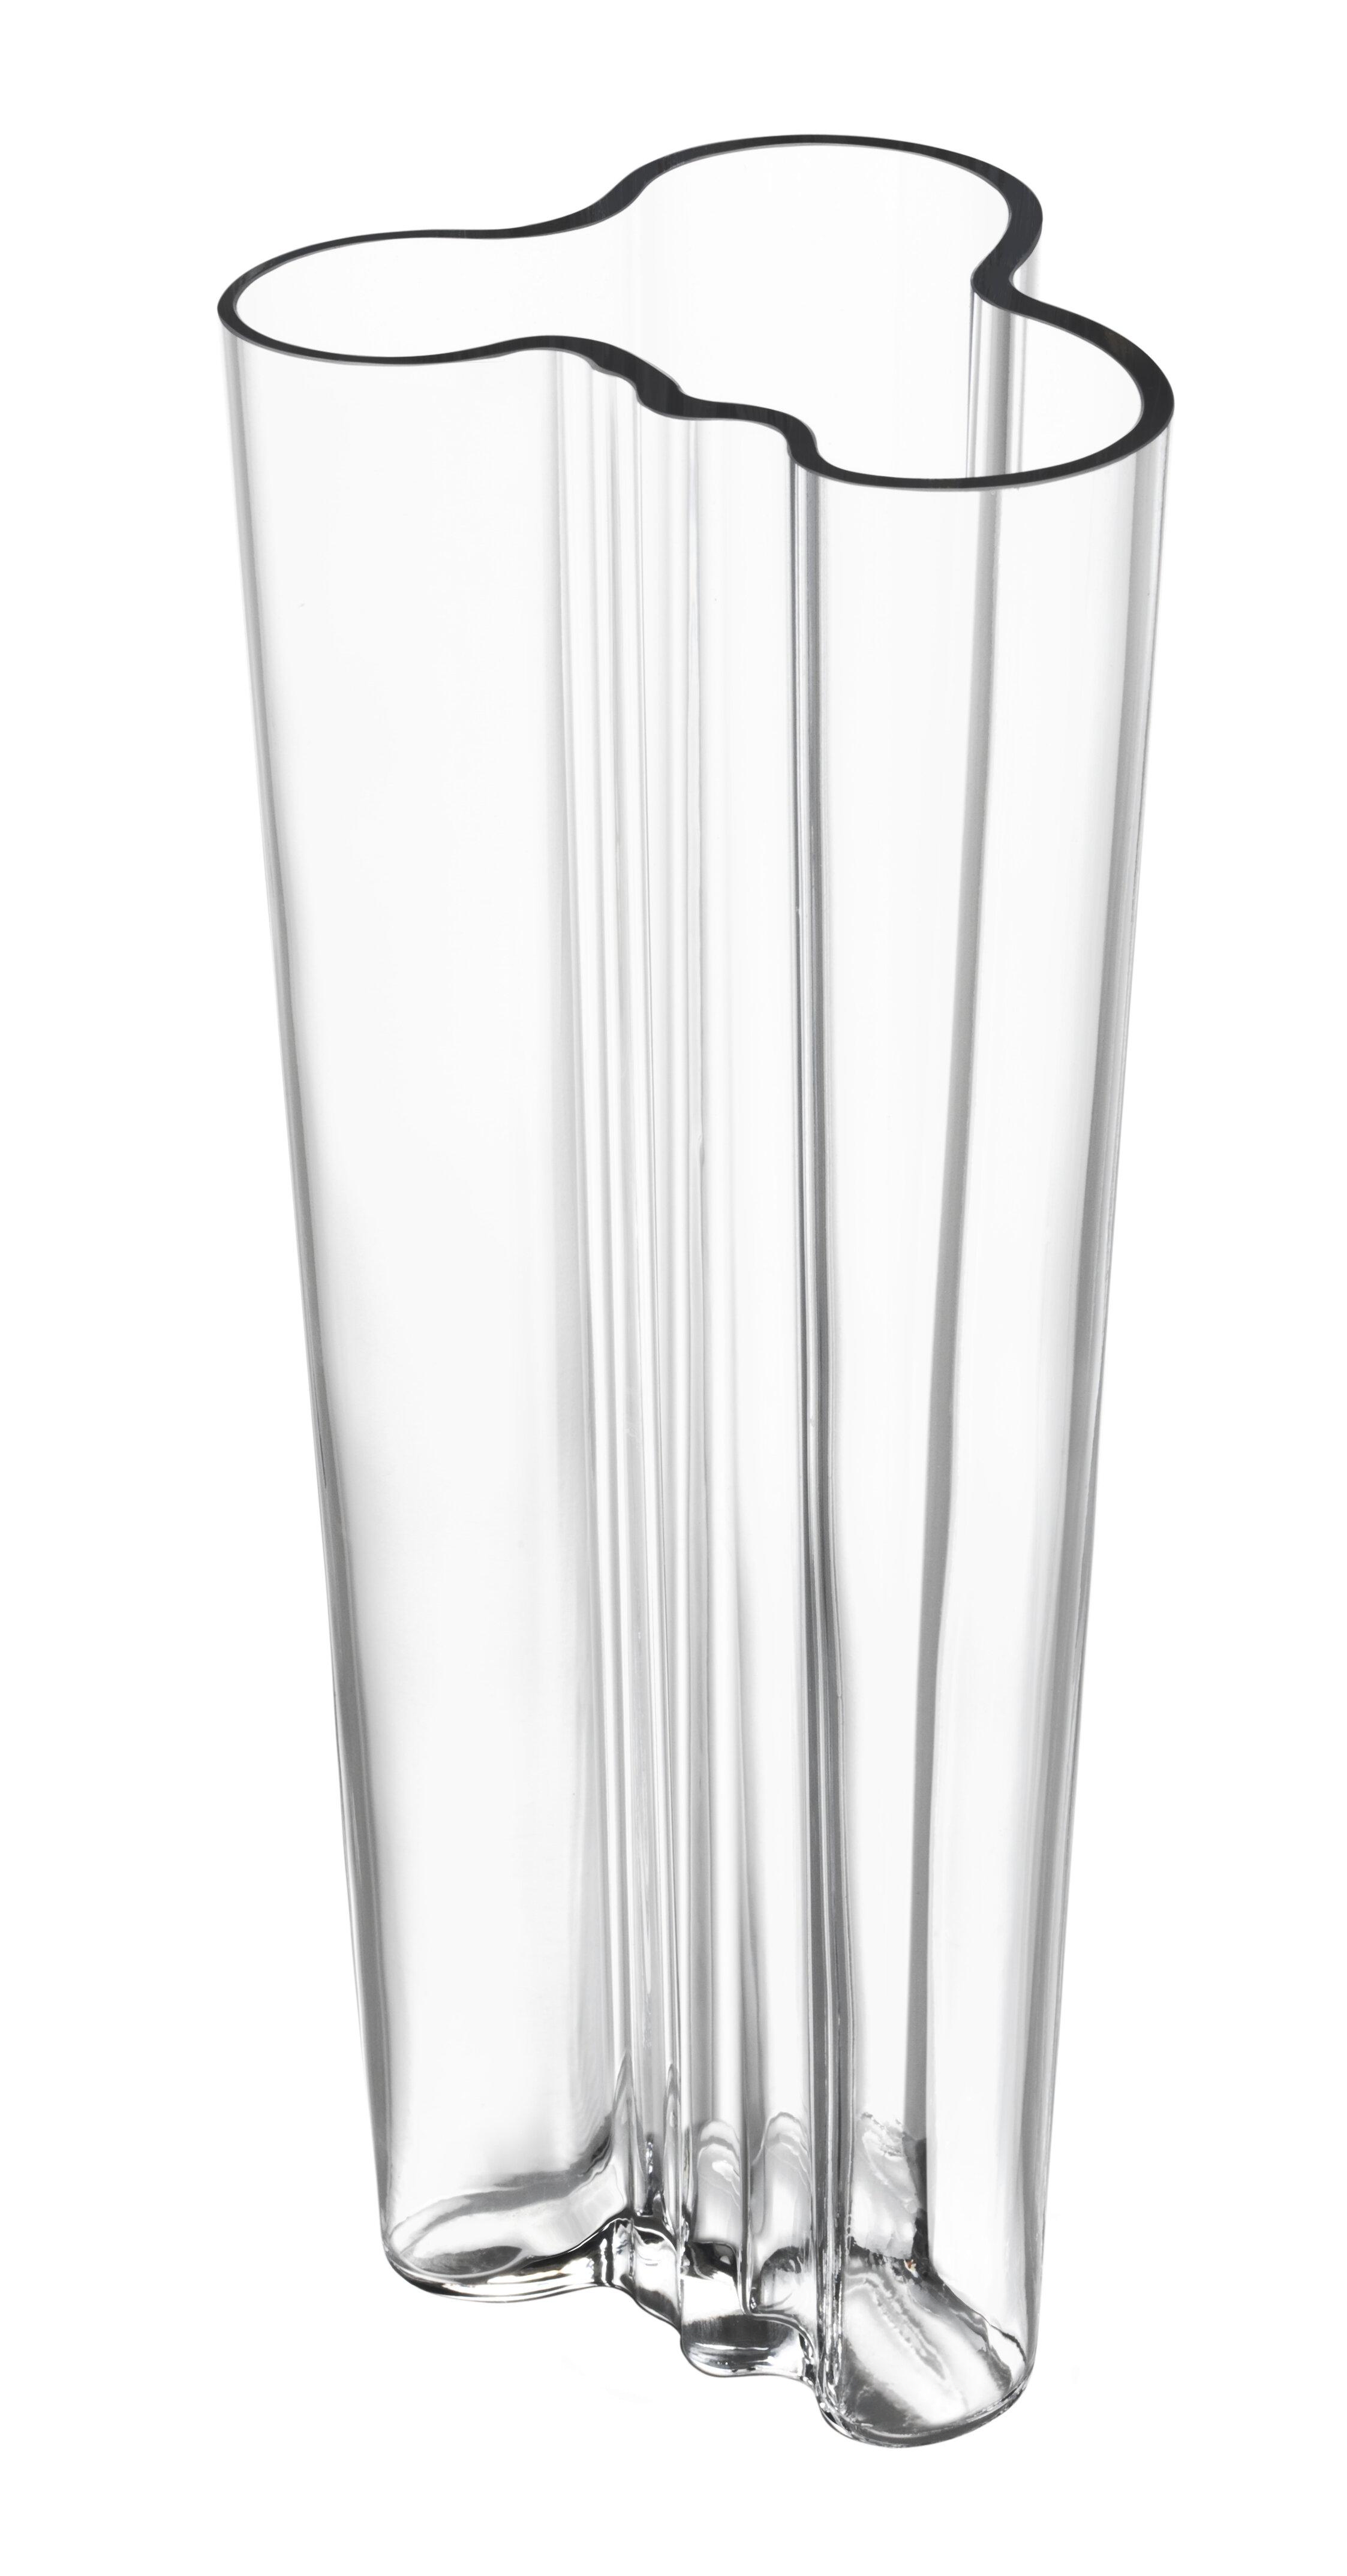 Alvar aalto vase reviews allmodern reviewsmspy